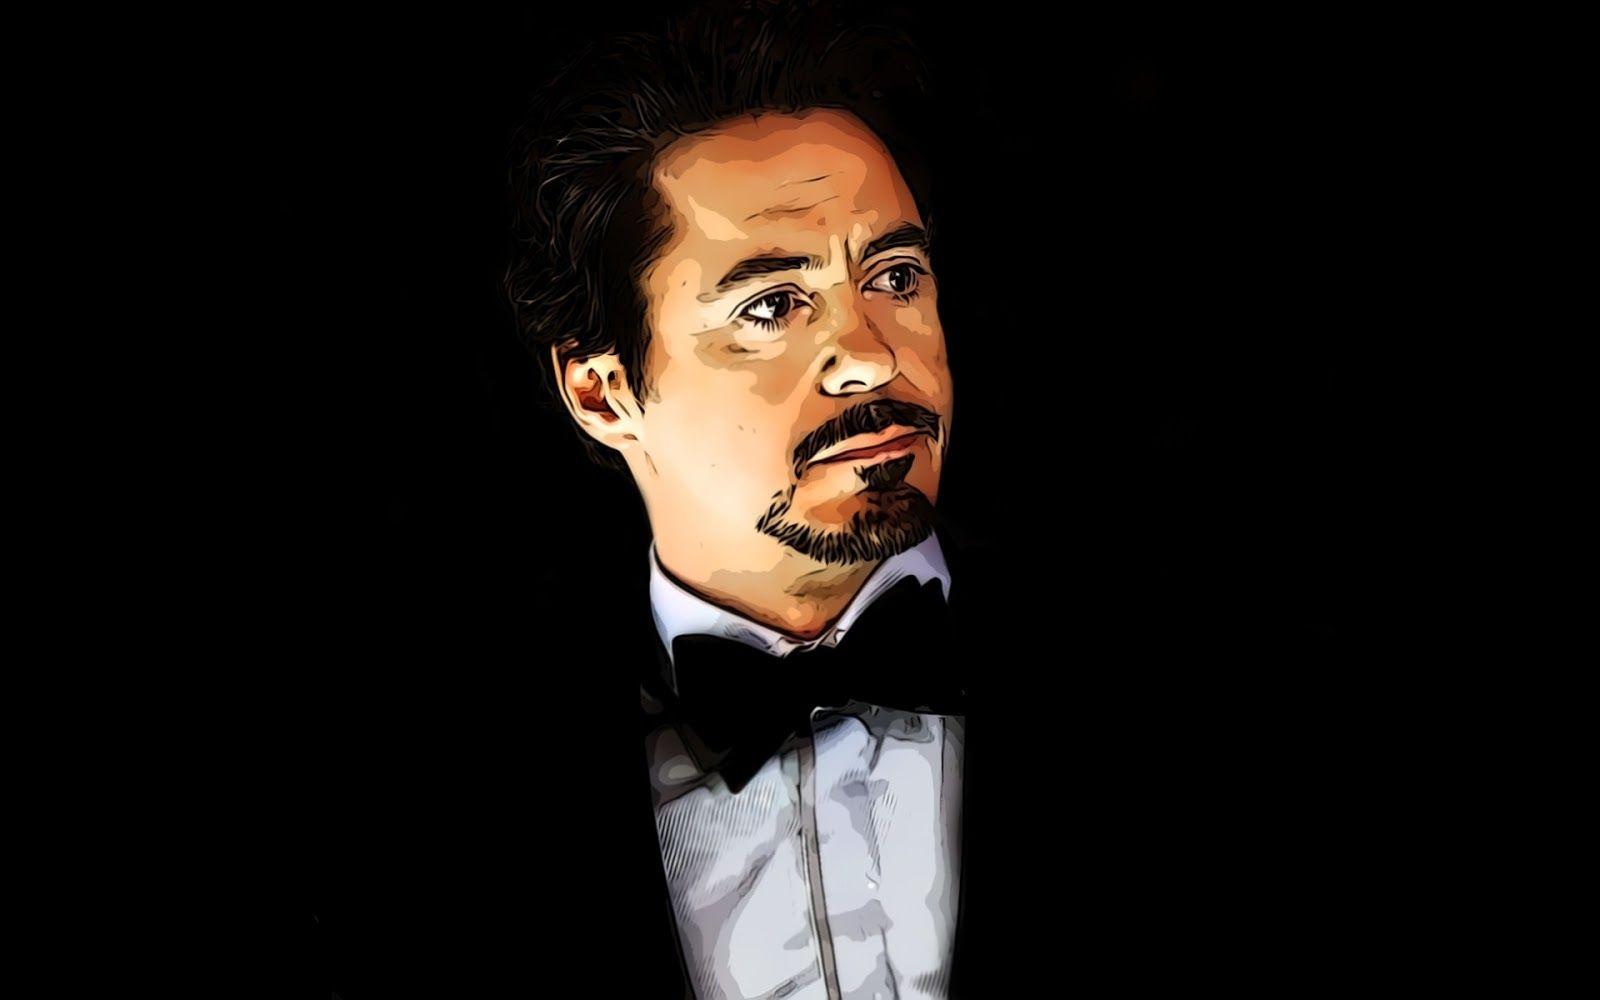 Robert Downey Jr Wallpapers Free Fotos Suenos